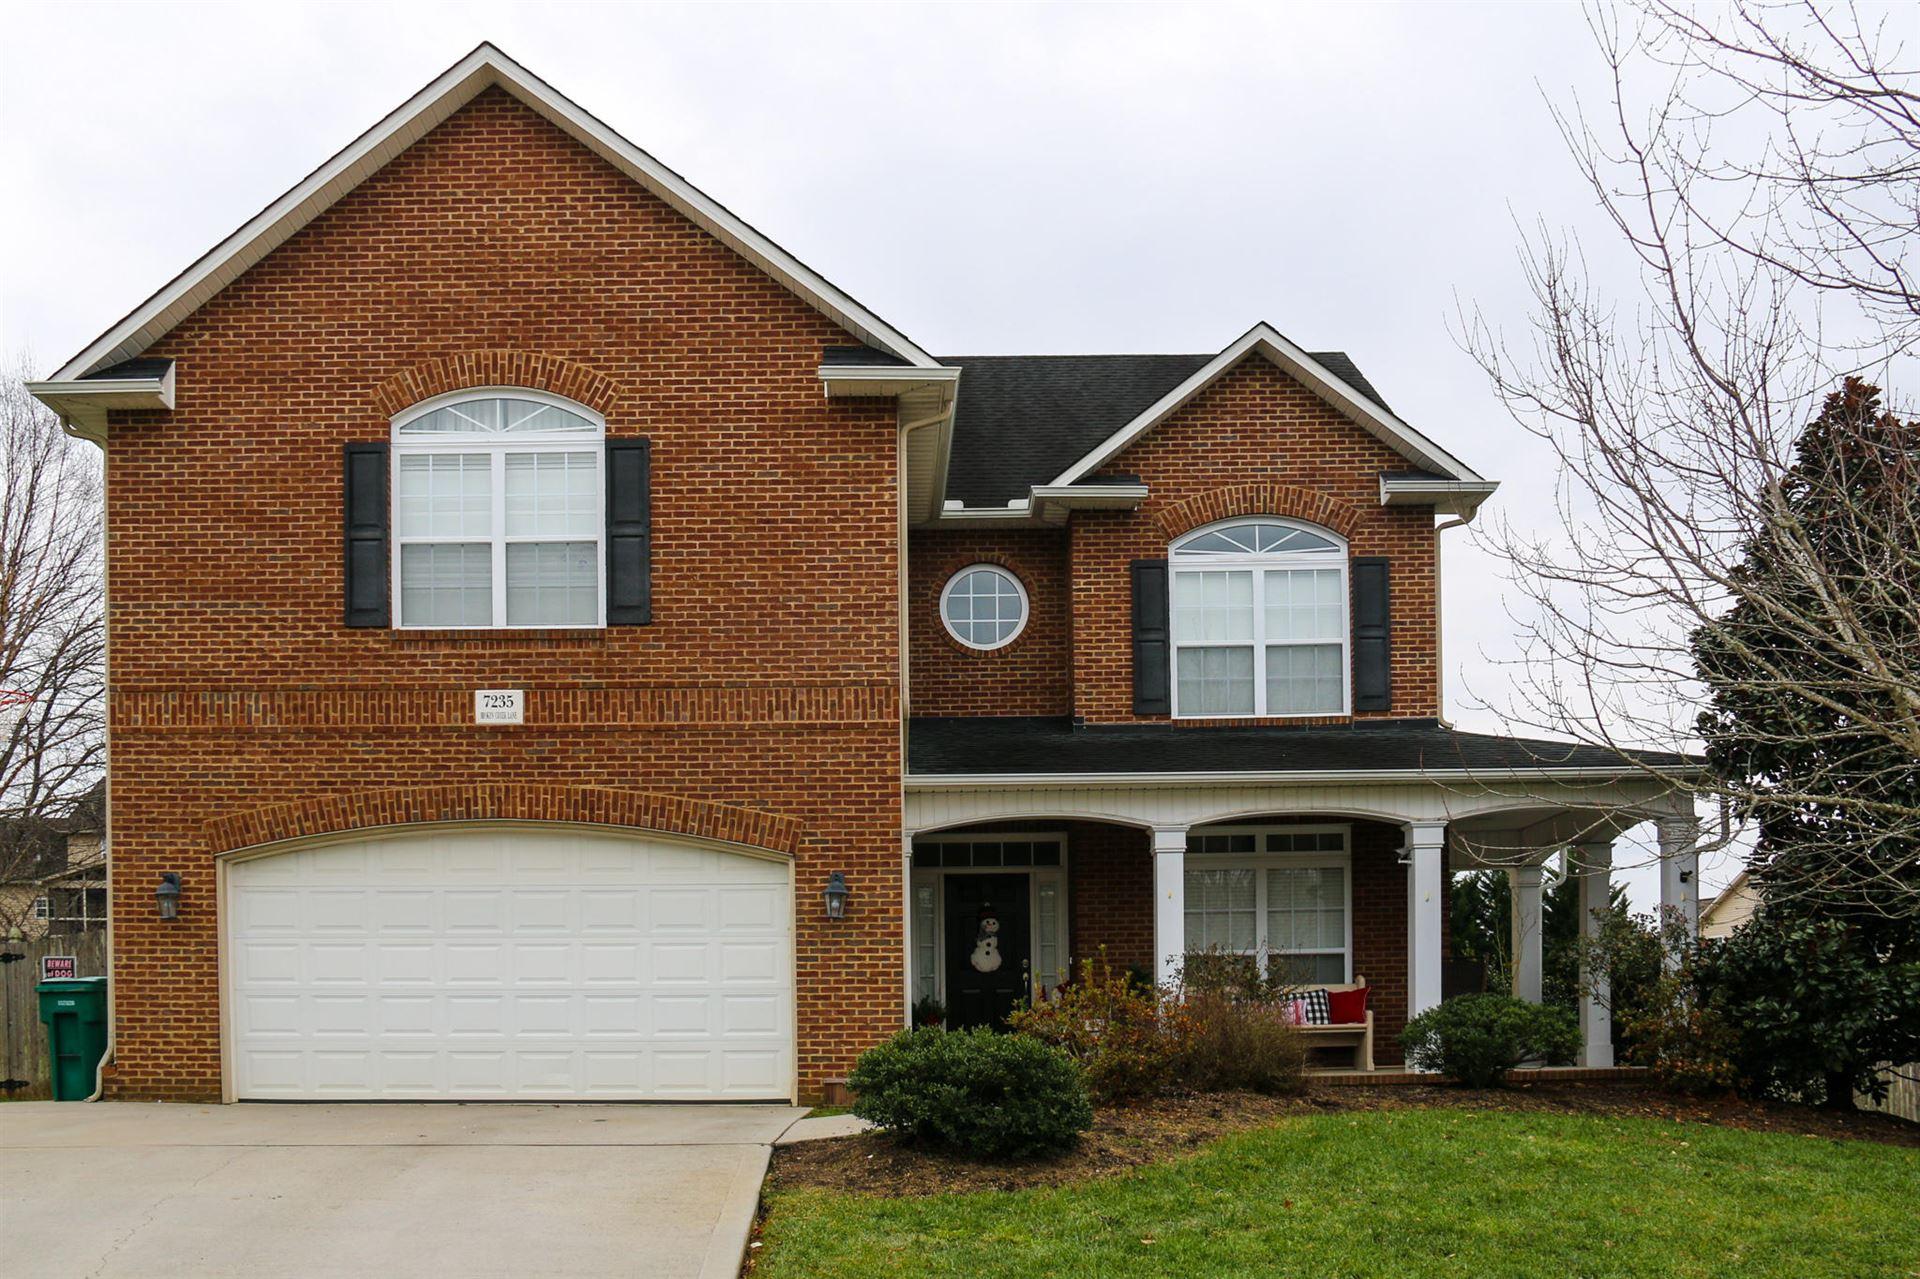 Photo of 7235 Broken Creek Lane, Knoxville, TN 37920 (MLS # 1140208)